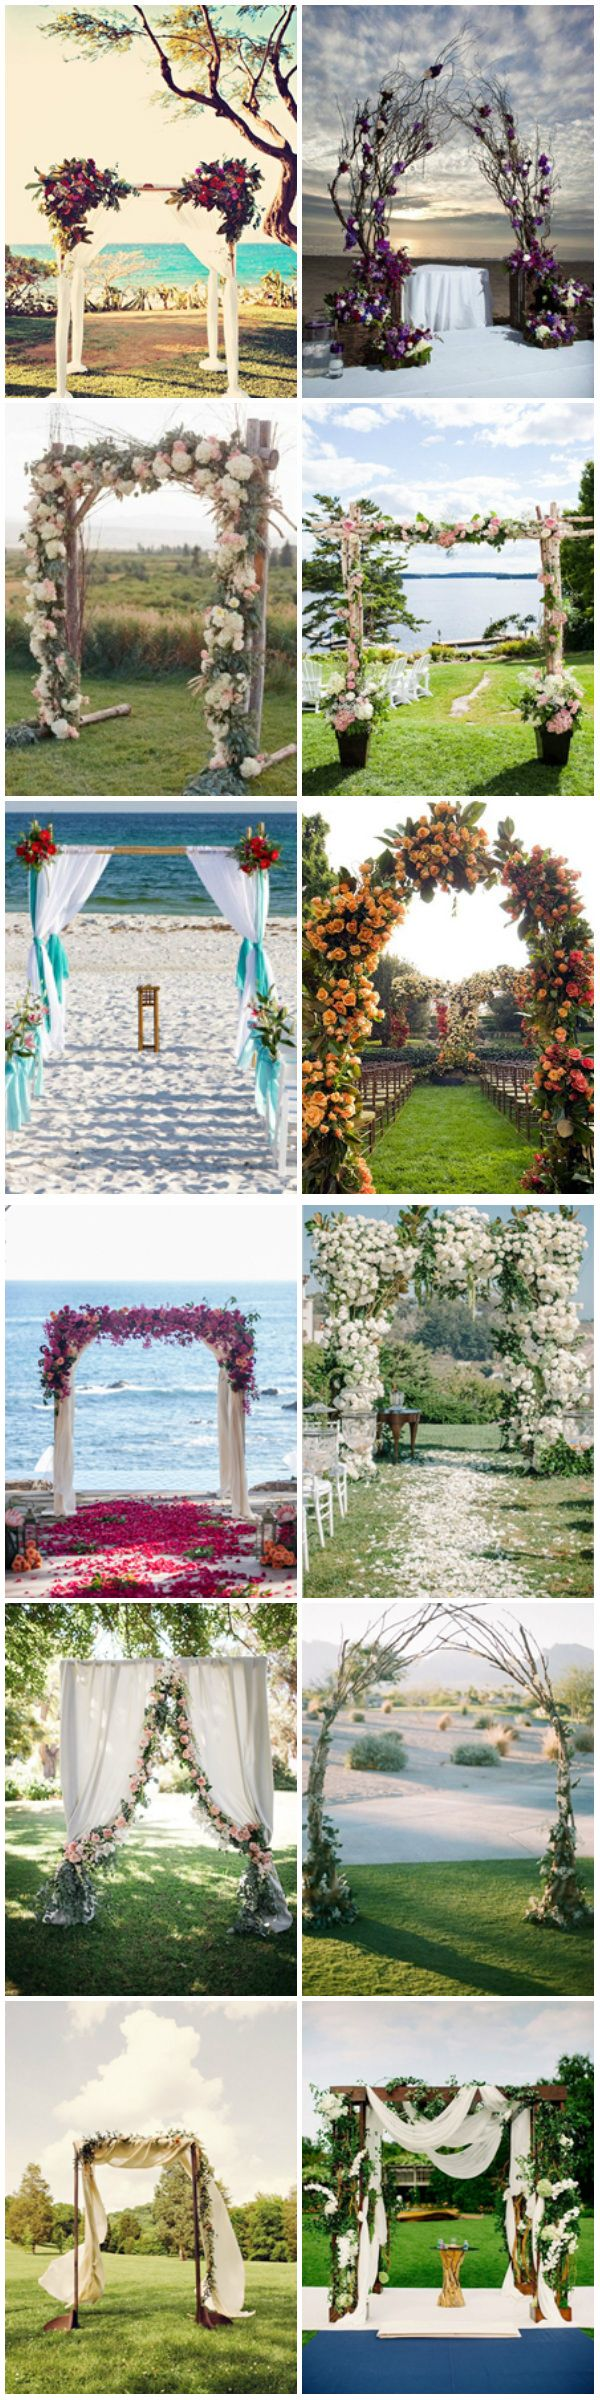 Unique Wedding Decorations Outdoor : Best ideas about backyard wedding decorations on